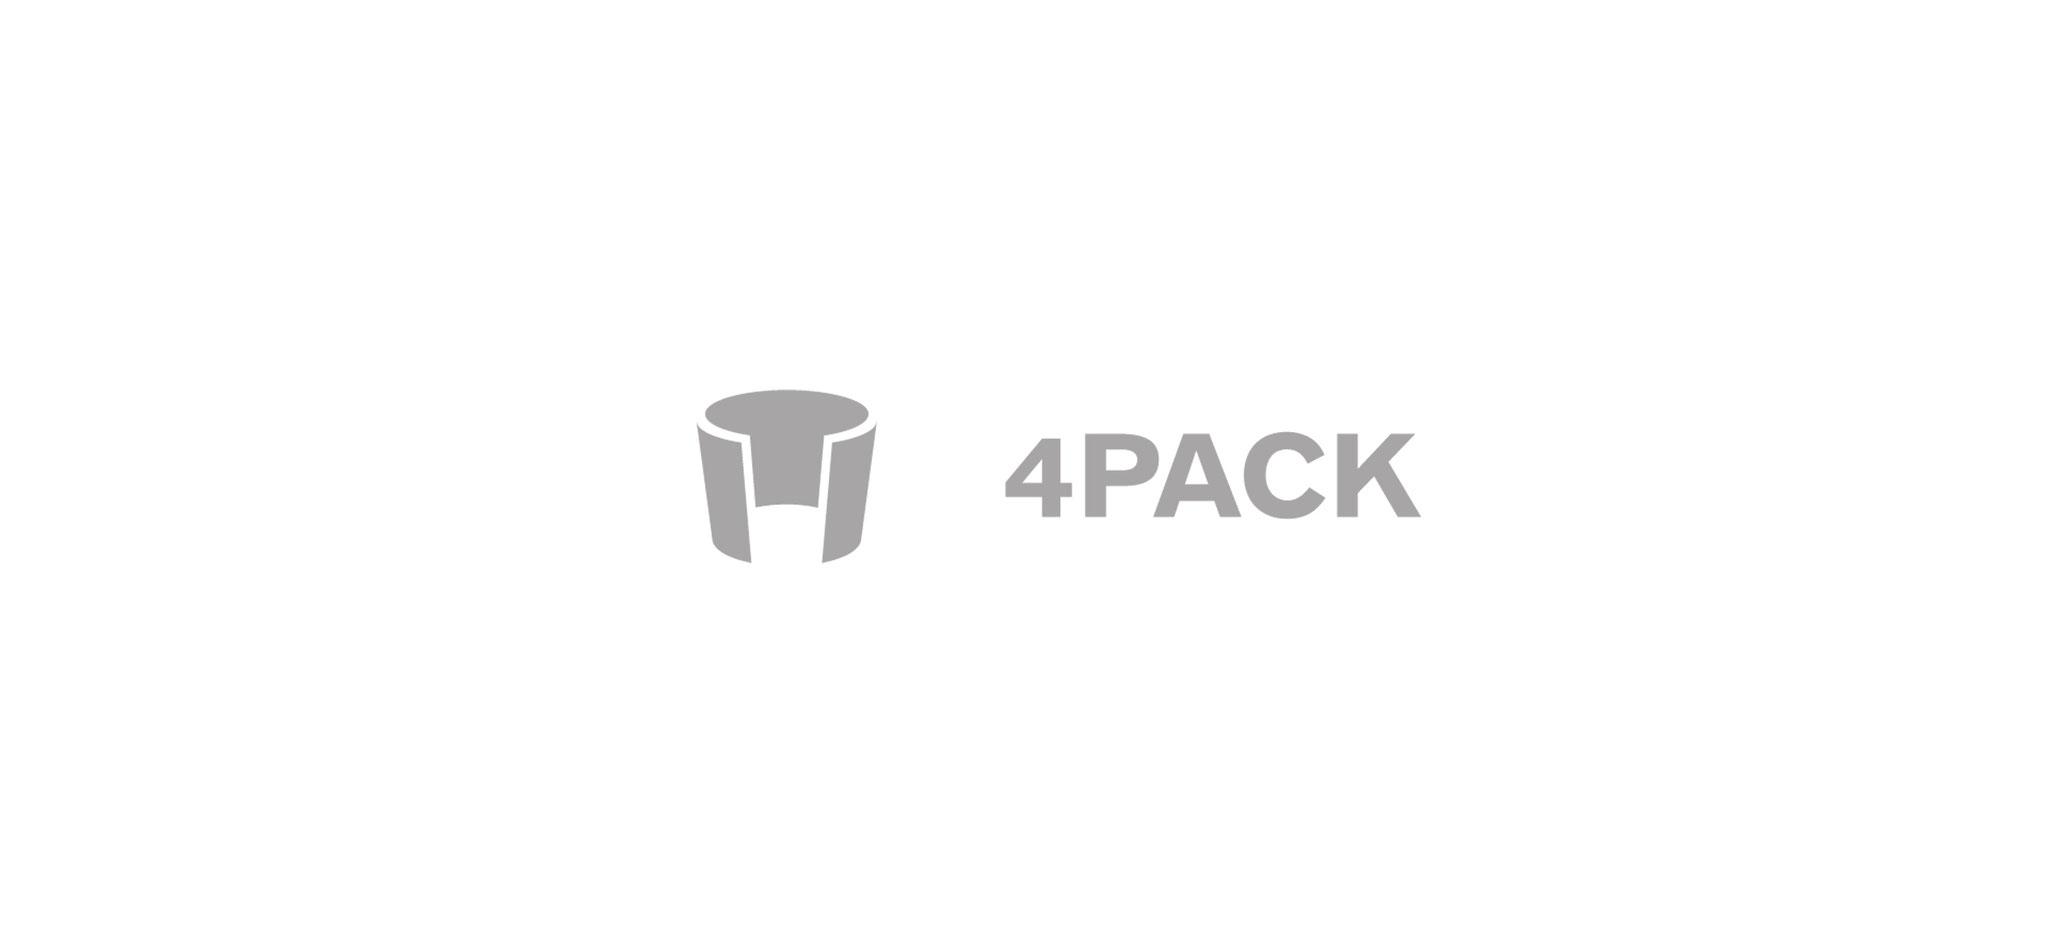 4PACK | logo – infragrau, gute gestaltung